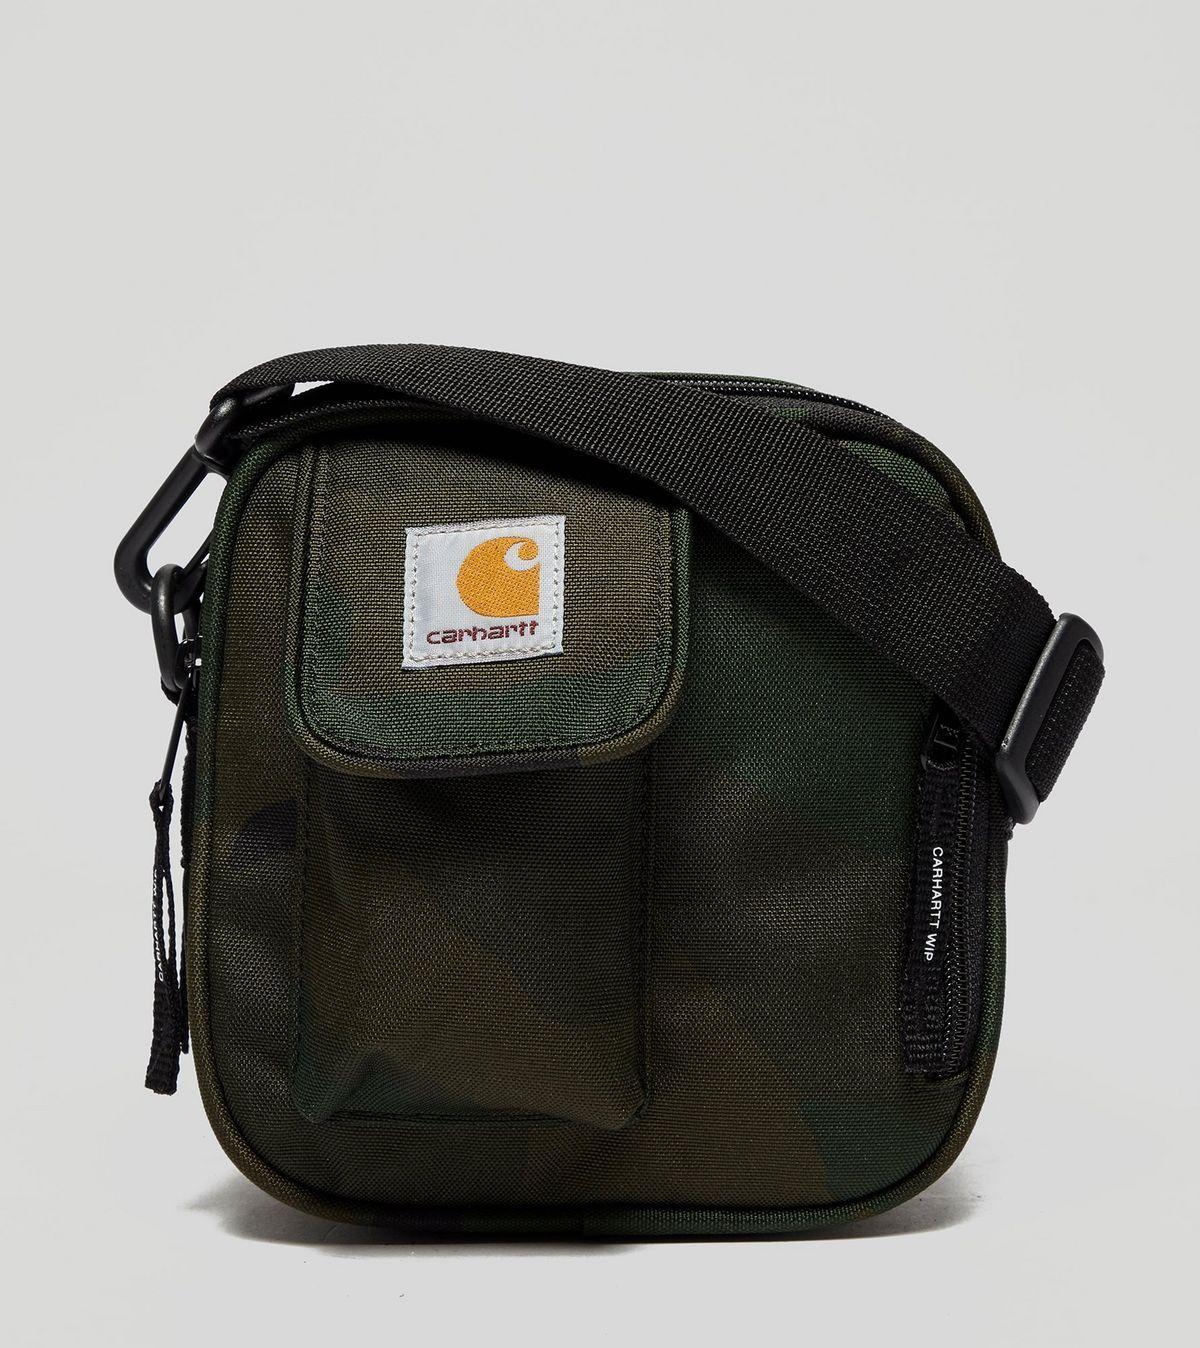 8283739e8e2 Carhartt WIP Essential Side Bag   Things I m Lovin    Carhartt, Side ...